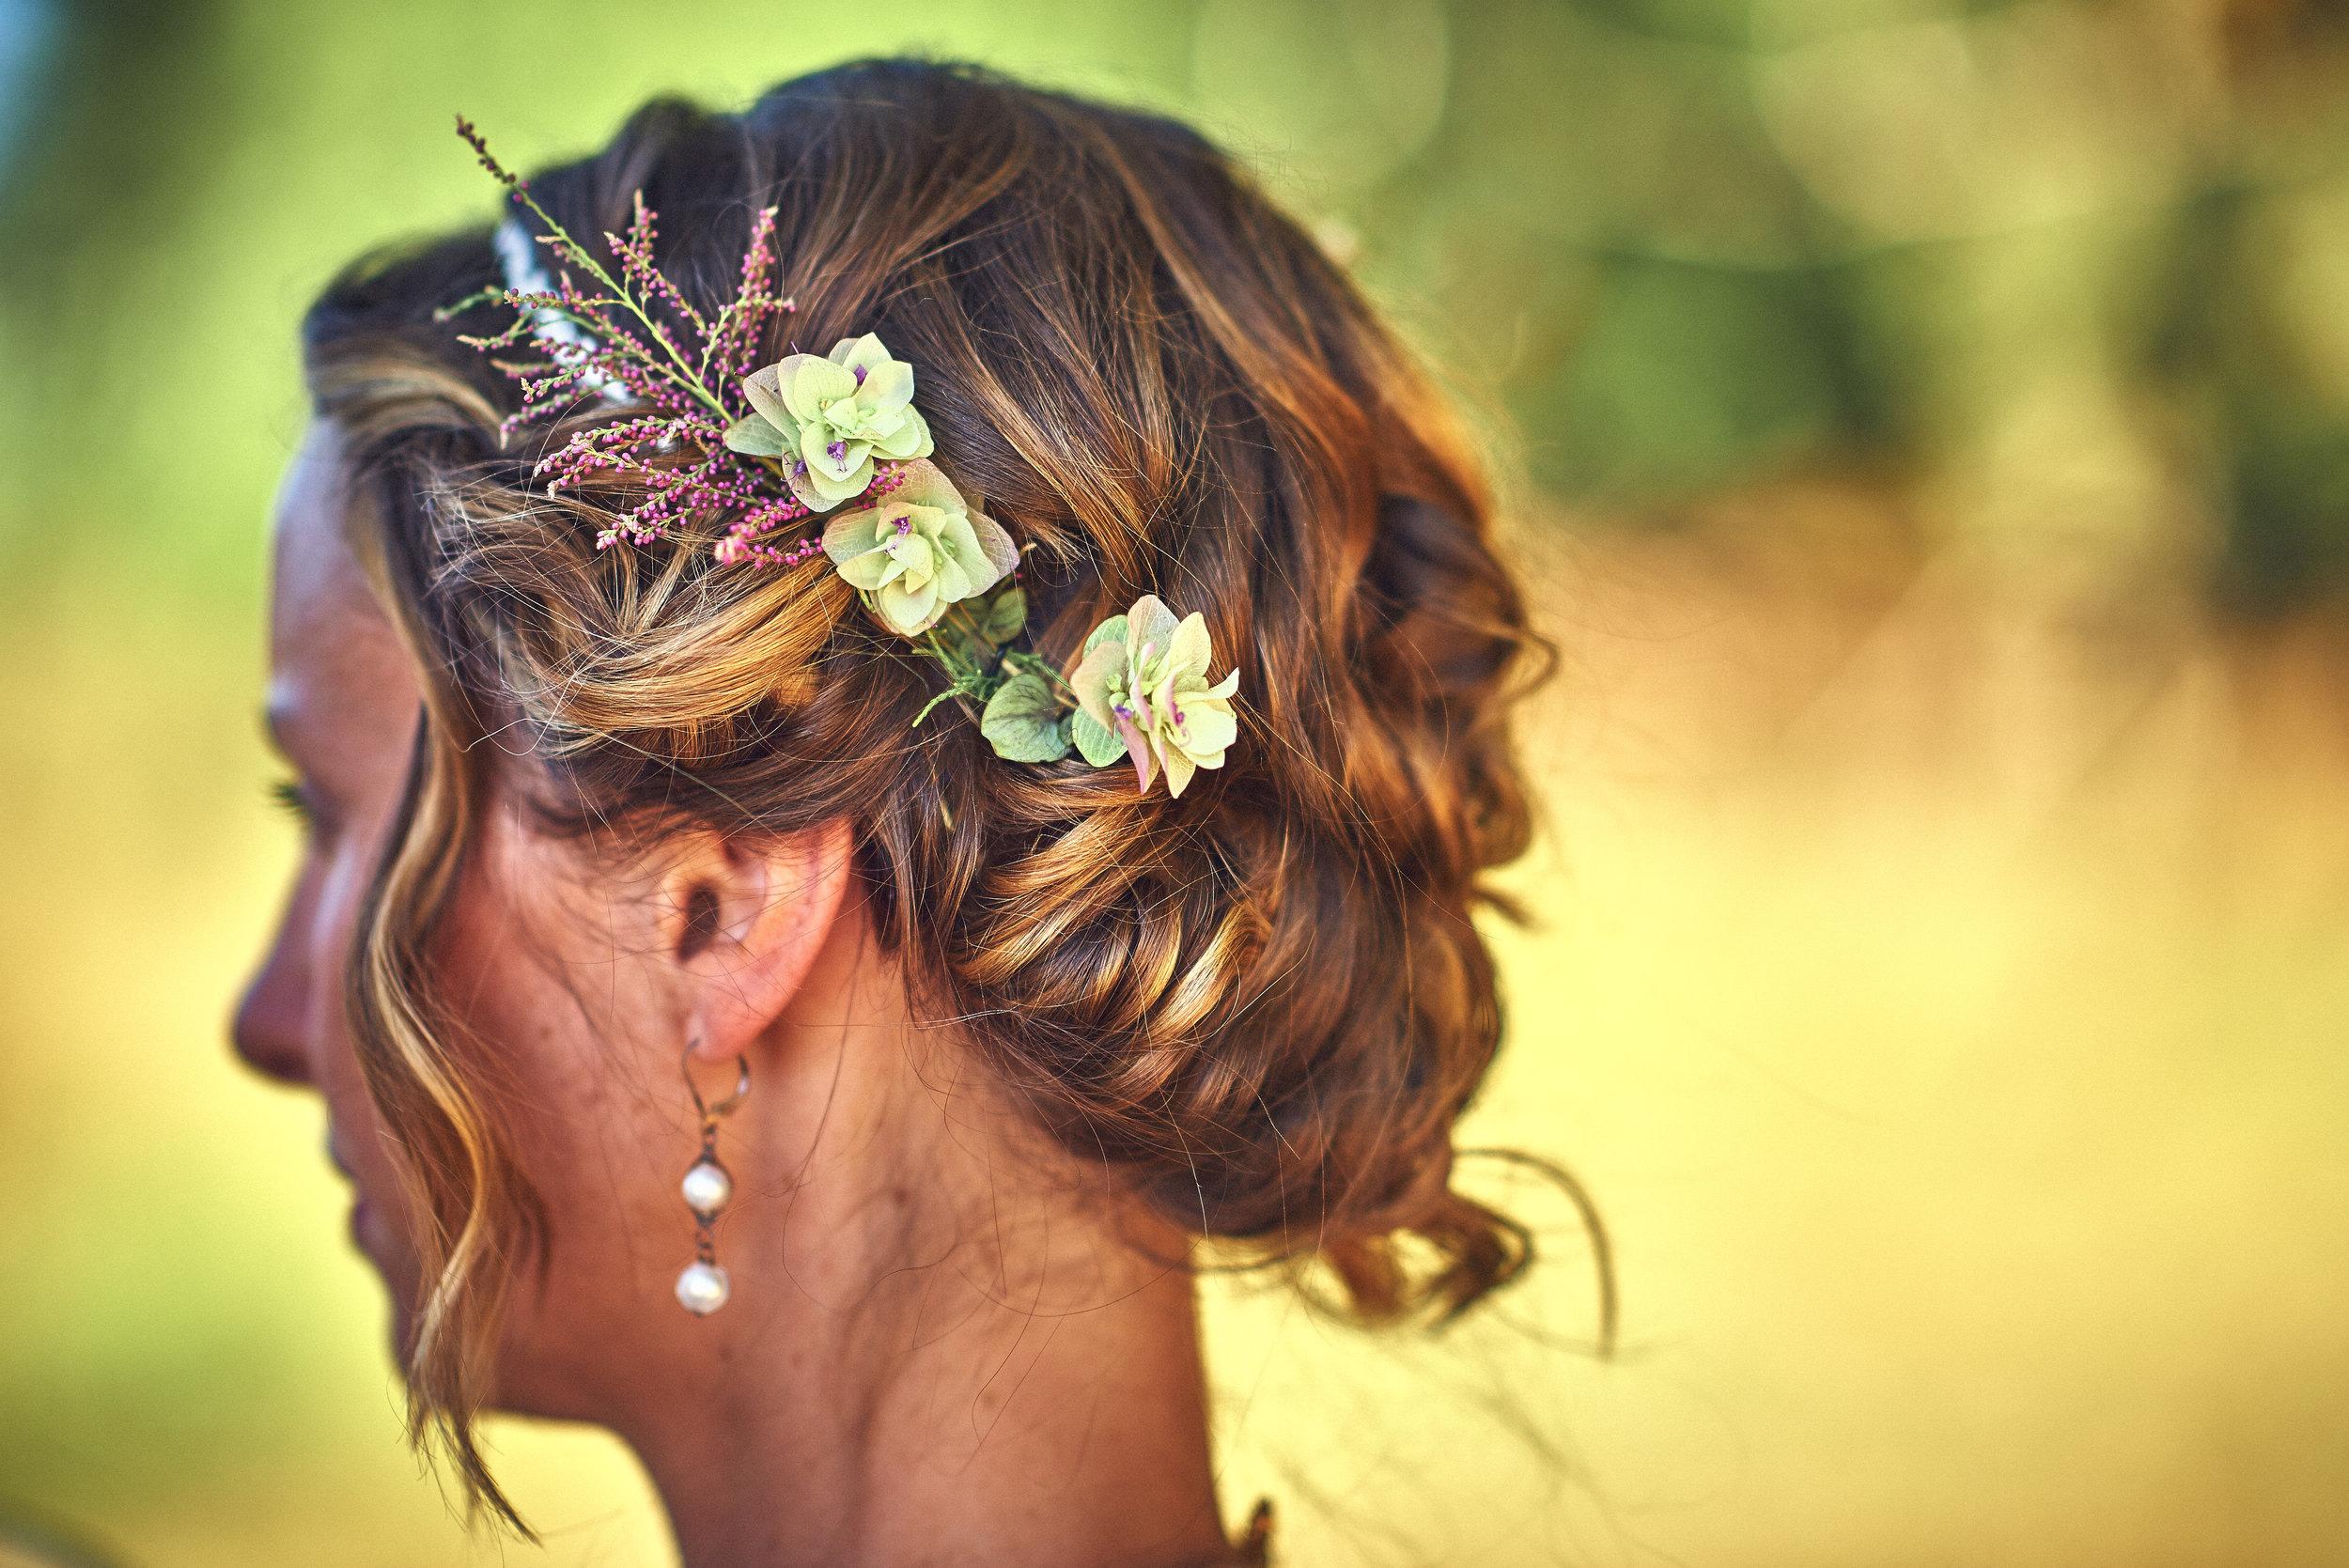 local flower hair piece at plum nelli farm wedding.jpg